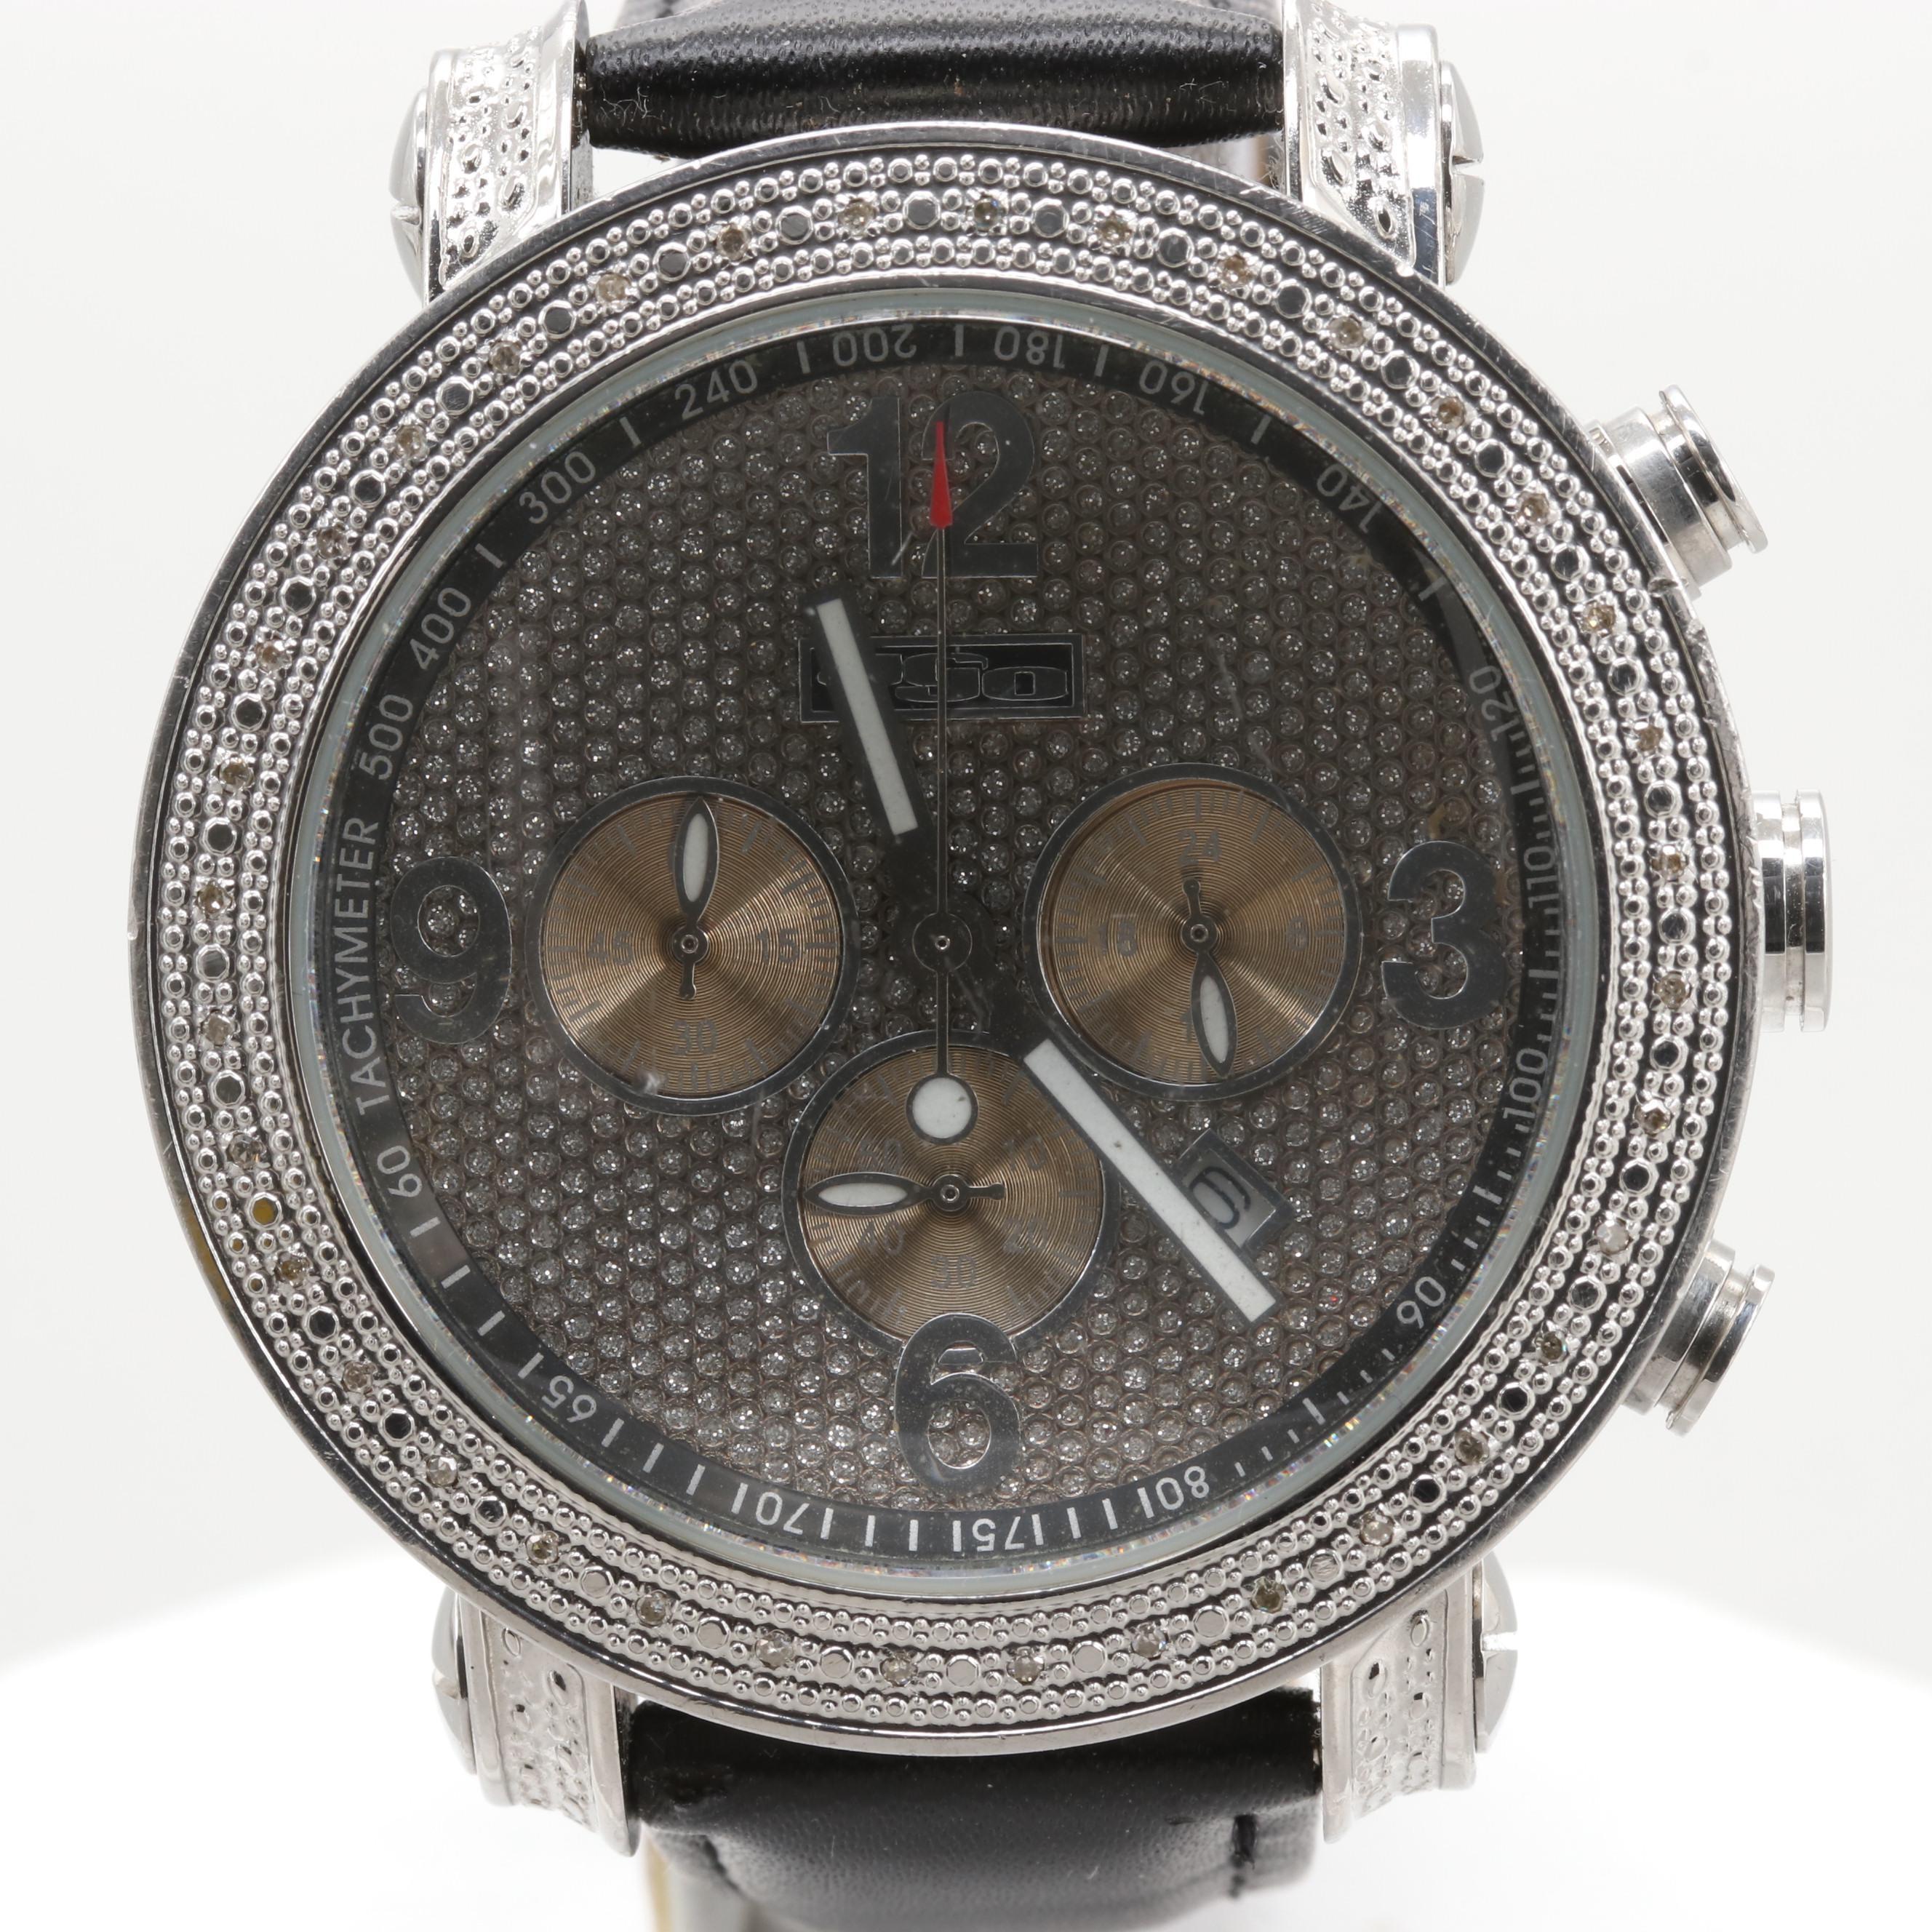 JoJo Stainless Steel and Diamond Chronograph Wristwatch with Date Window